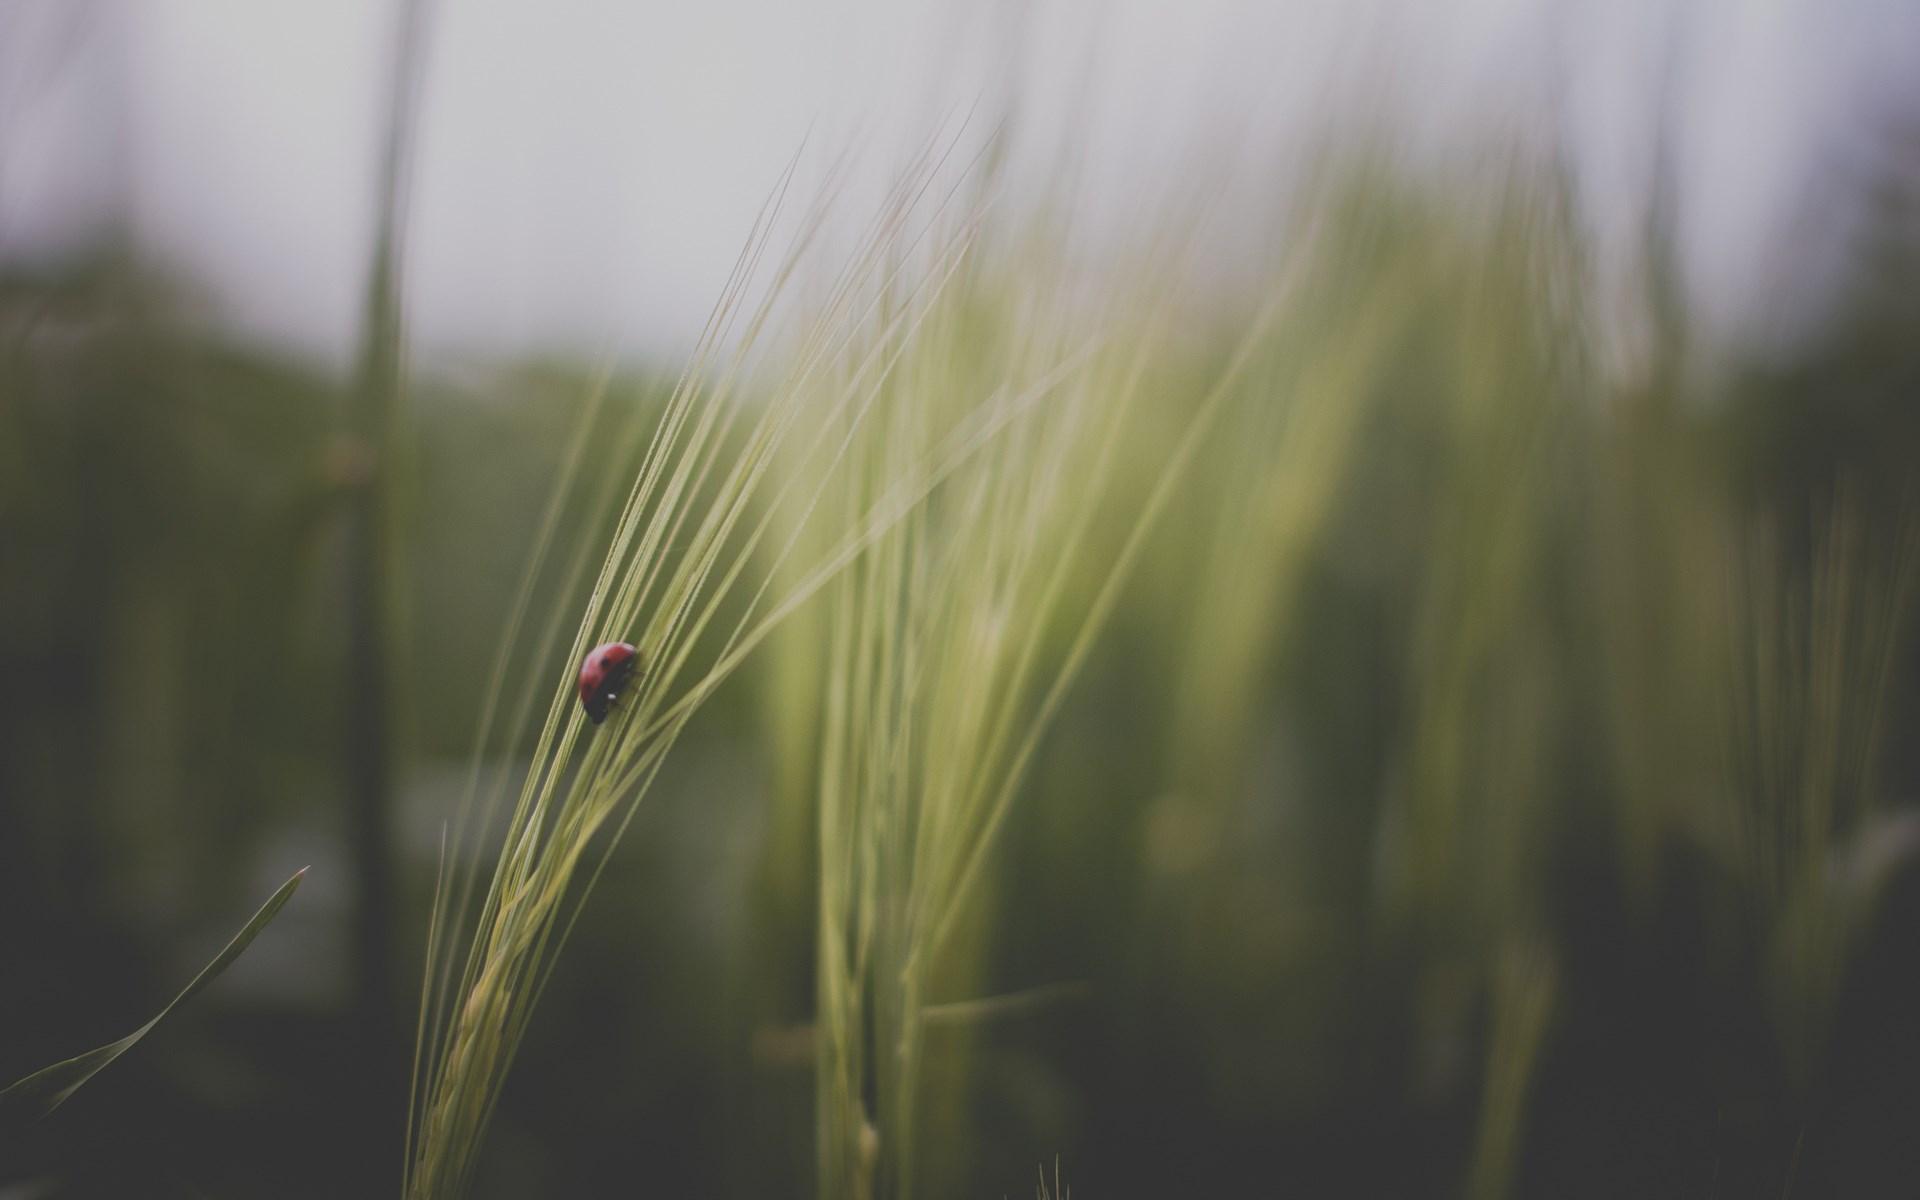 Ladybug Field Macro Nature